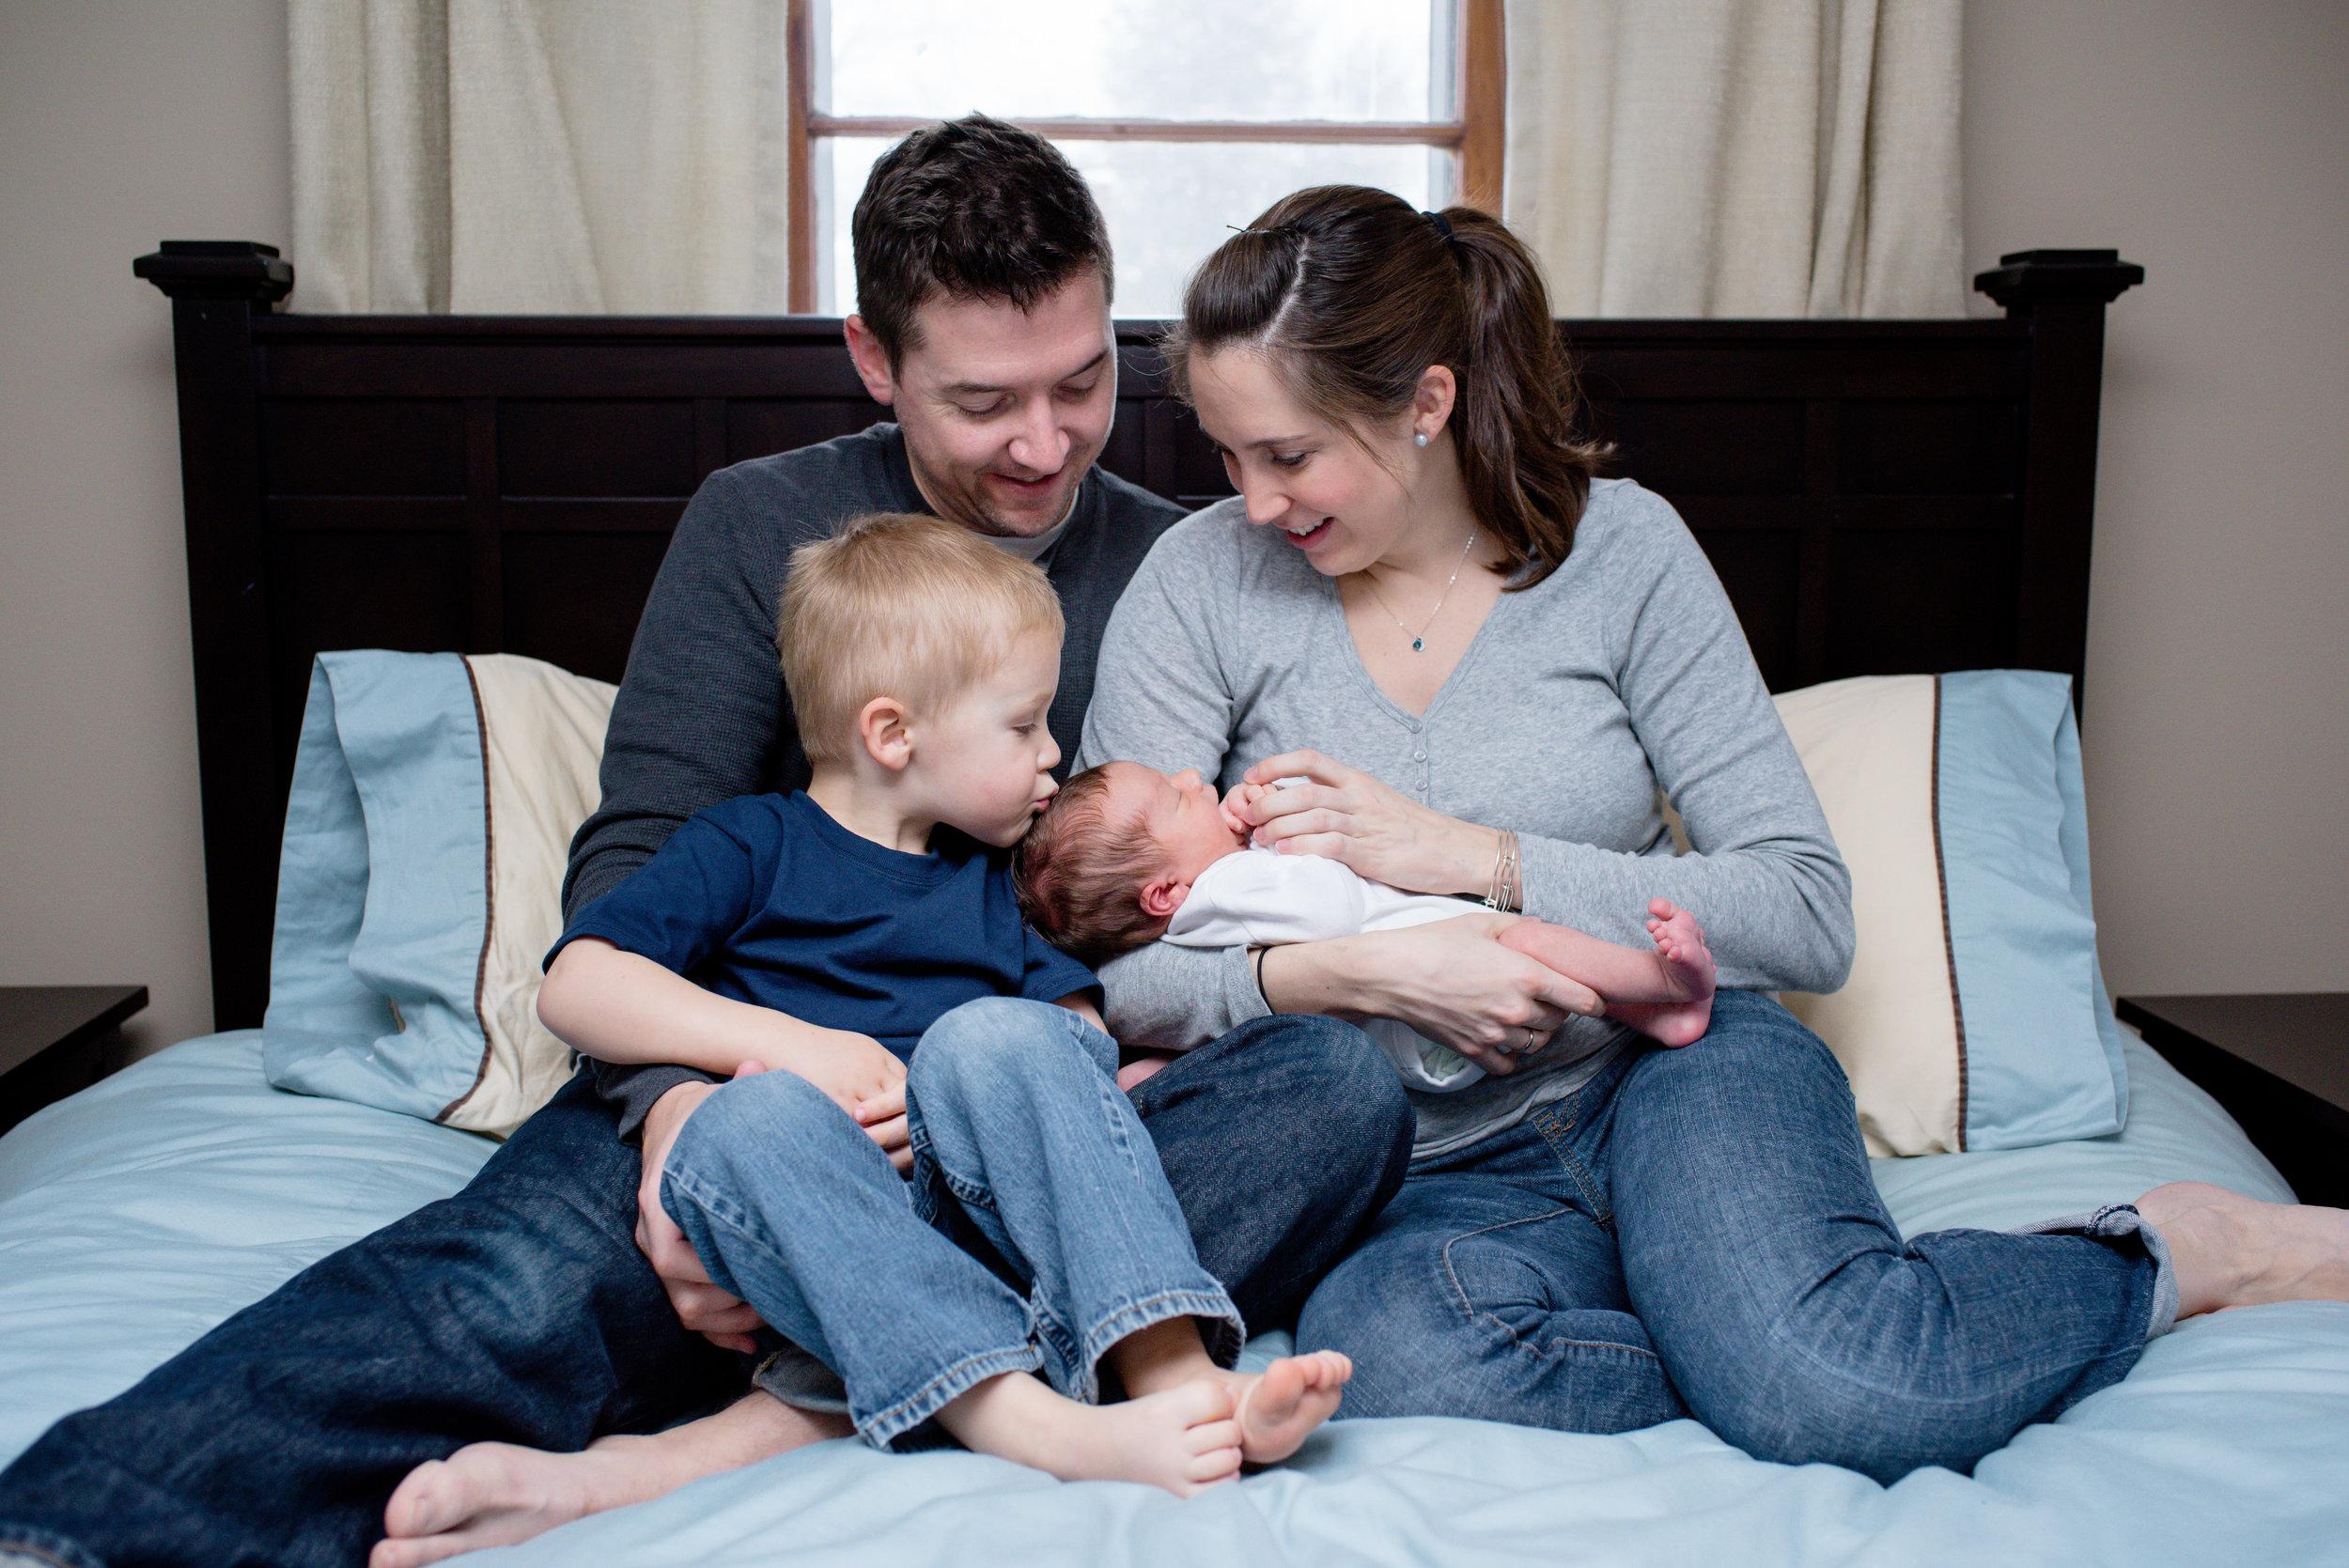 JuliaMatthewsPhotography_MadisonWisconsinFamilyPhotography_Newborn-10.jpg